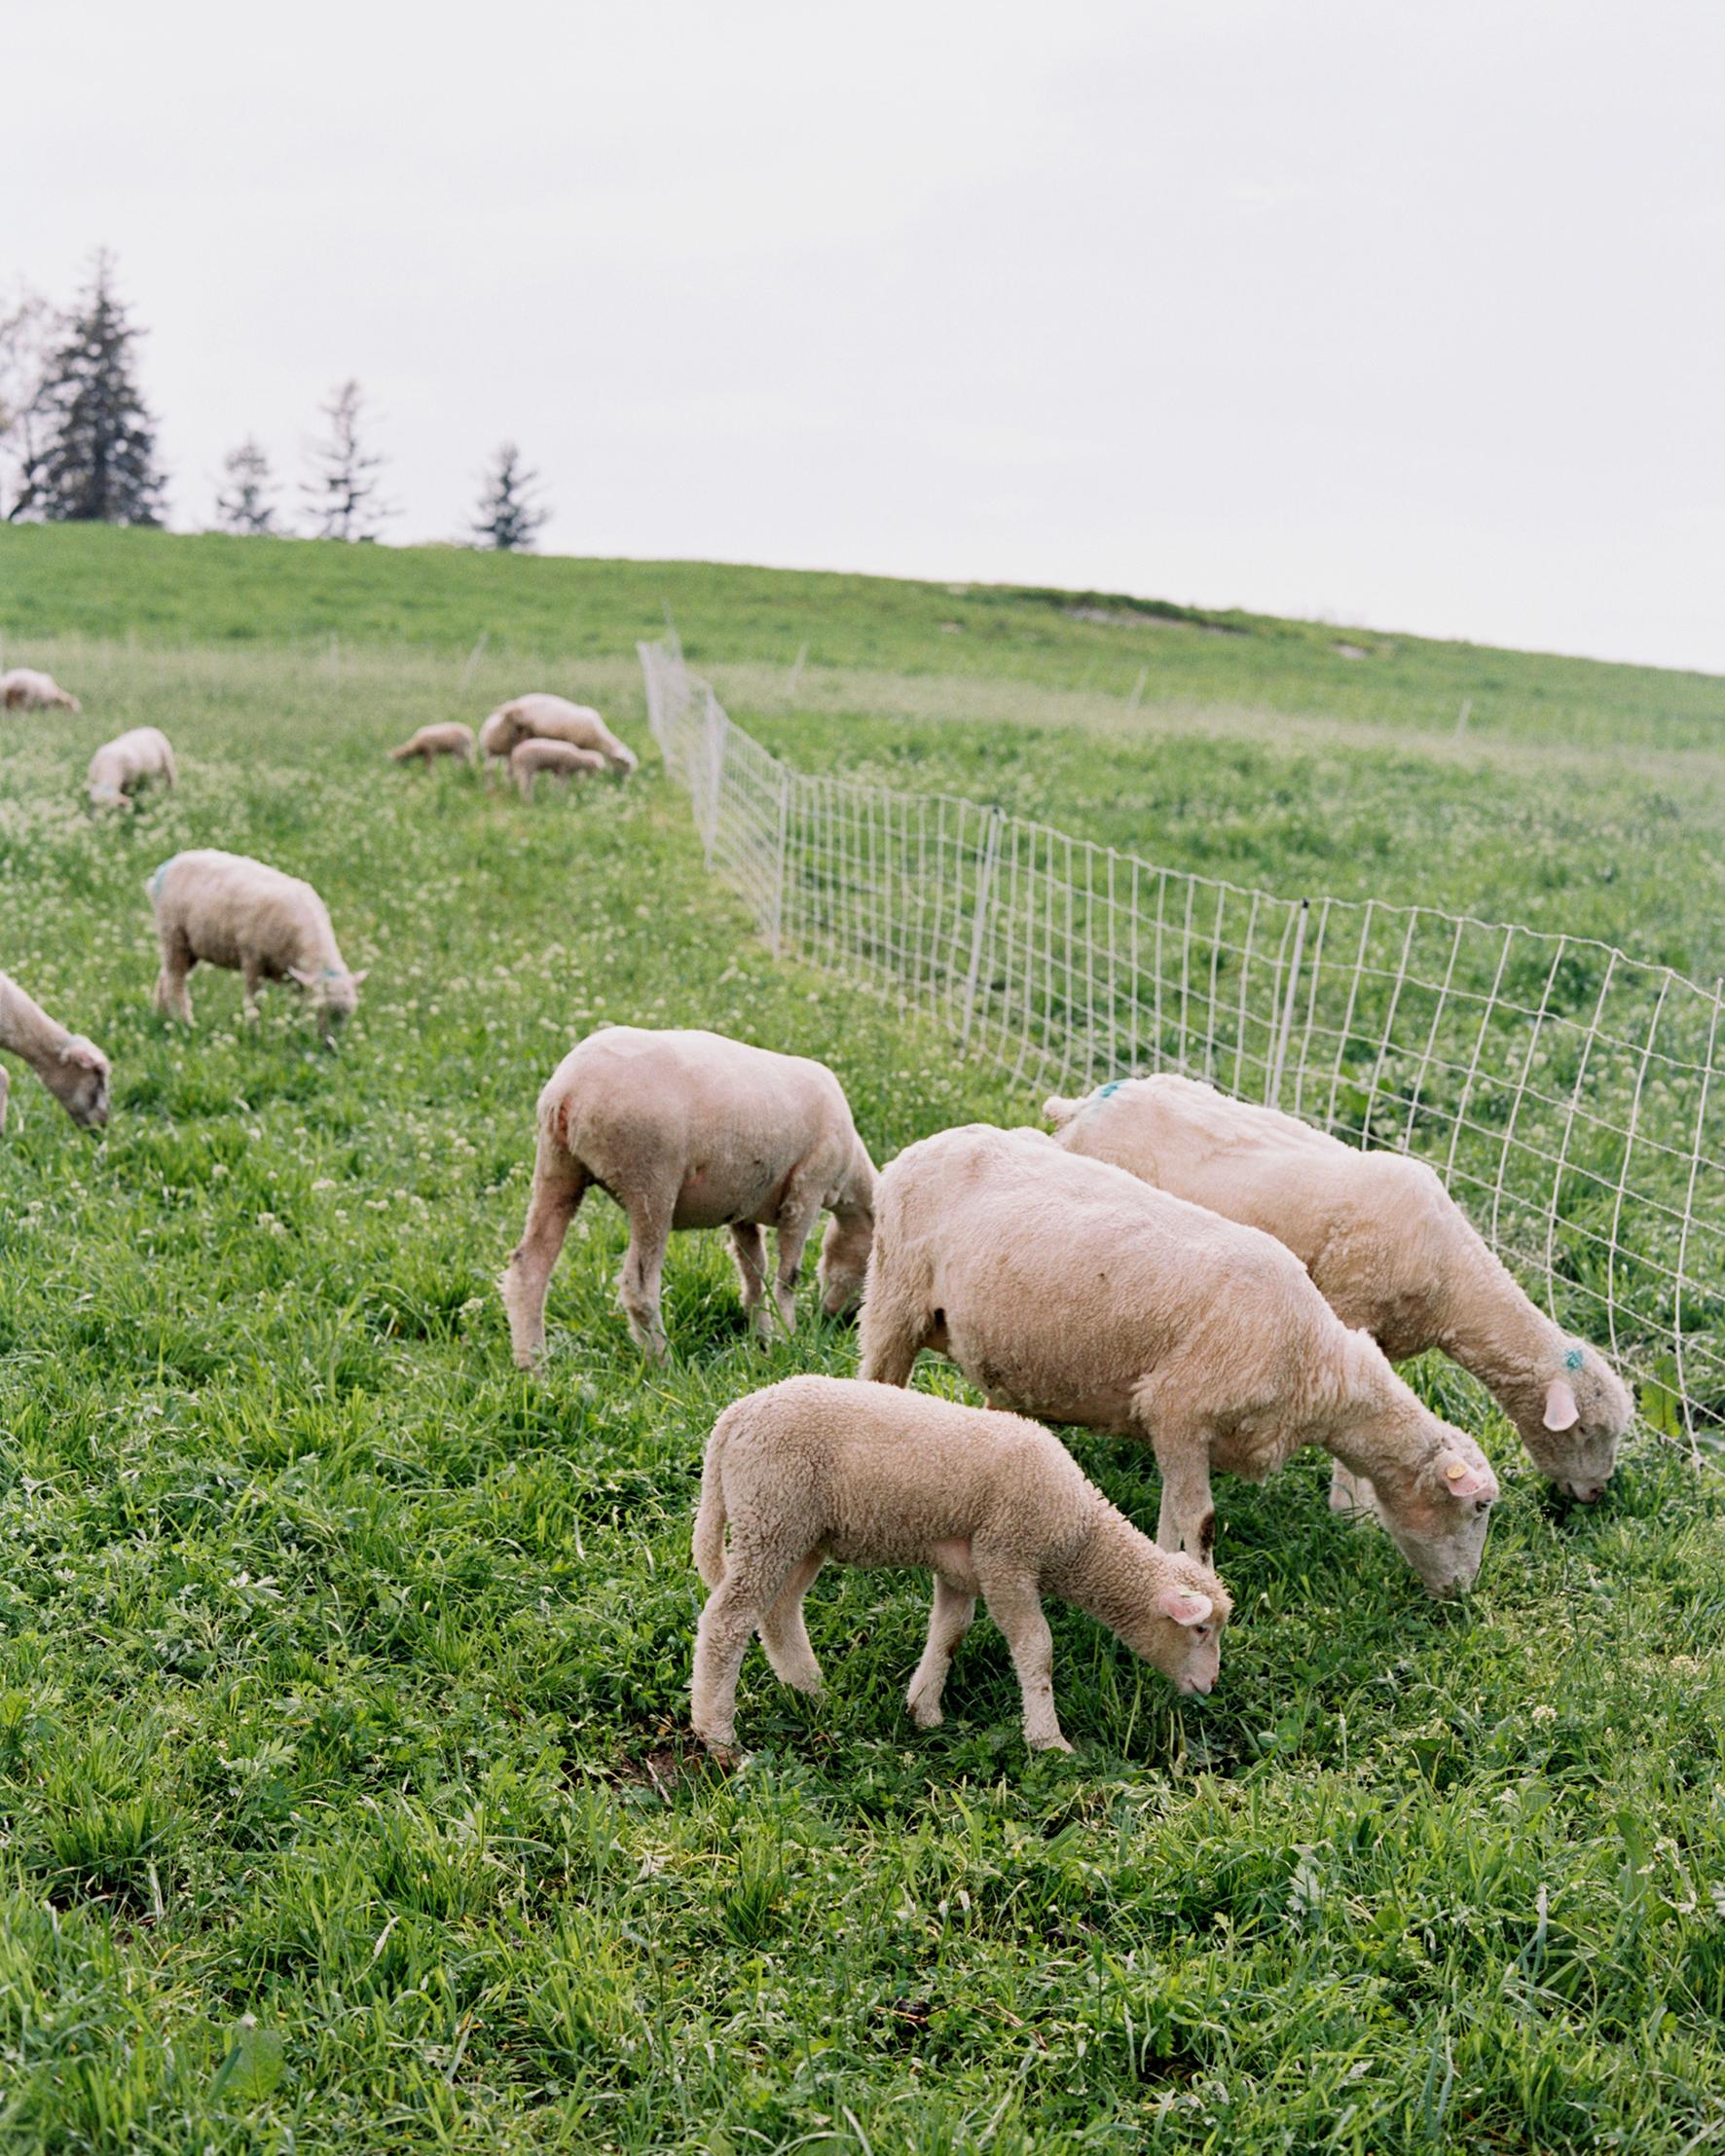 sydney-christina-wedding-sheep-006-s111743-0115.jpg